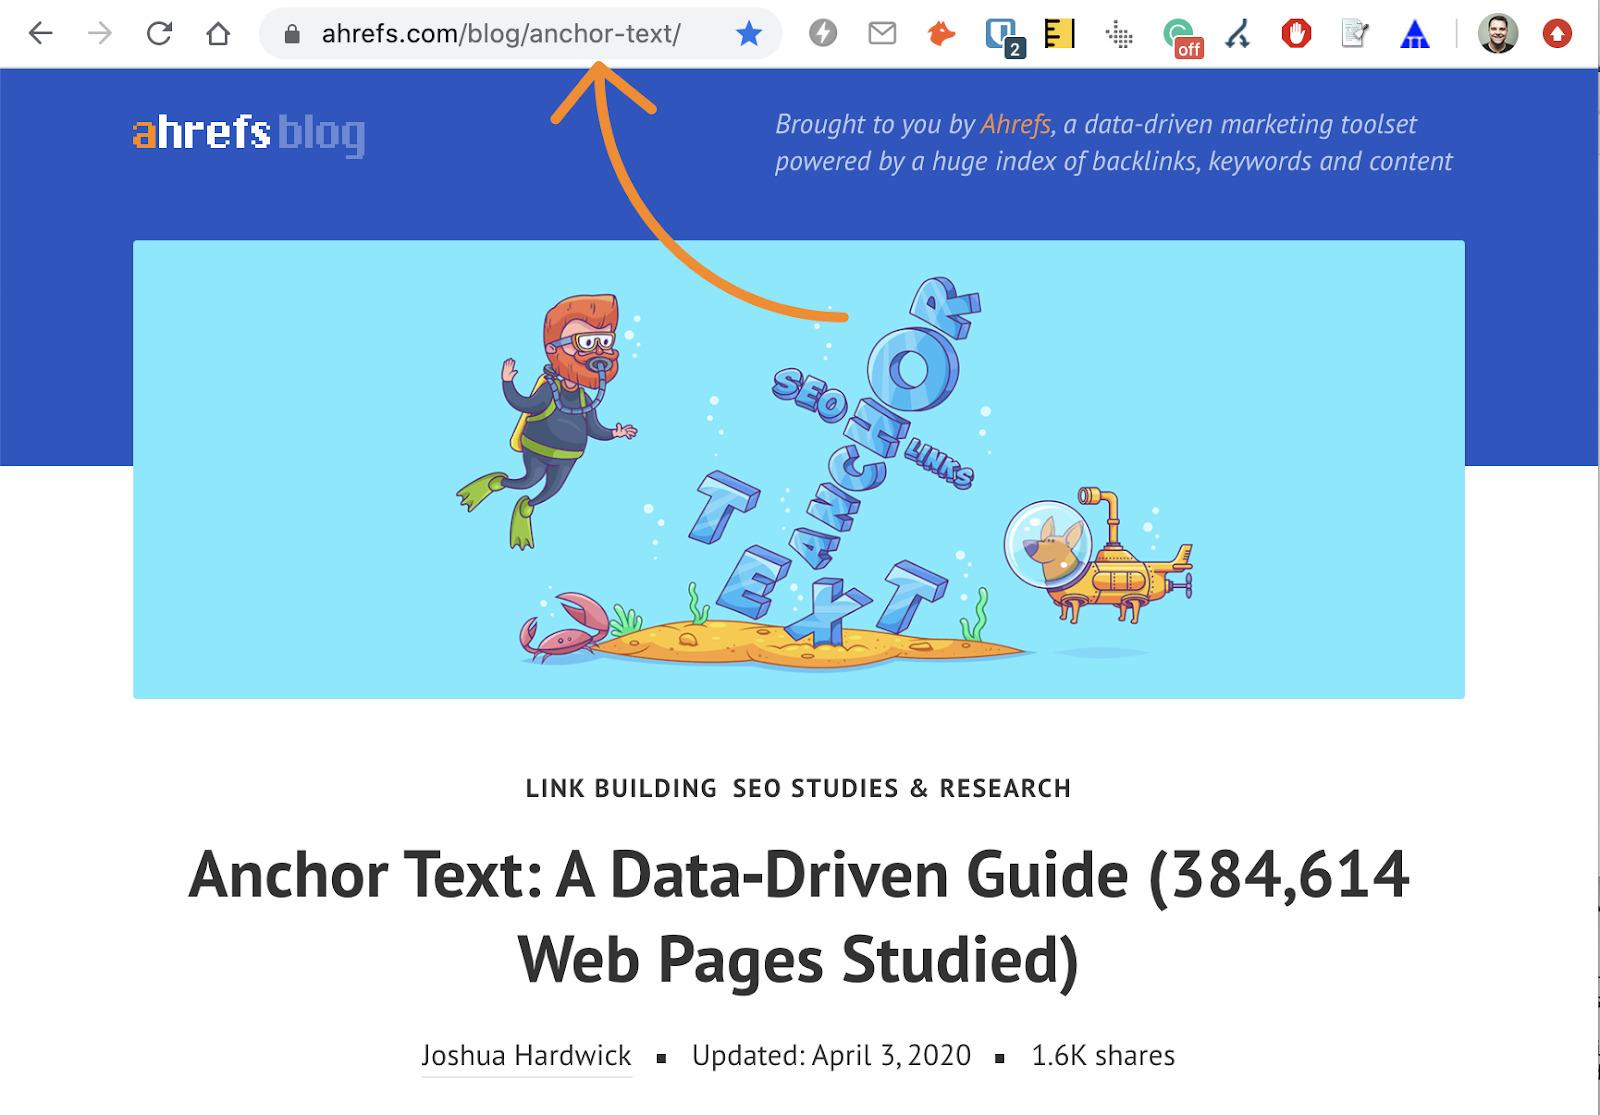 4 anchor text post